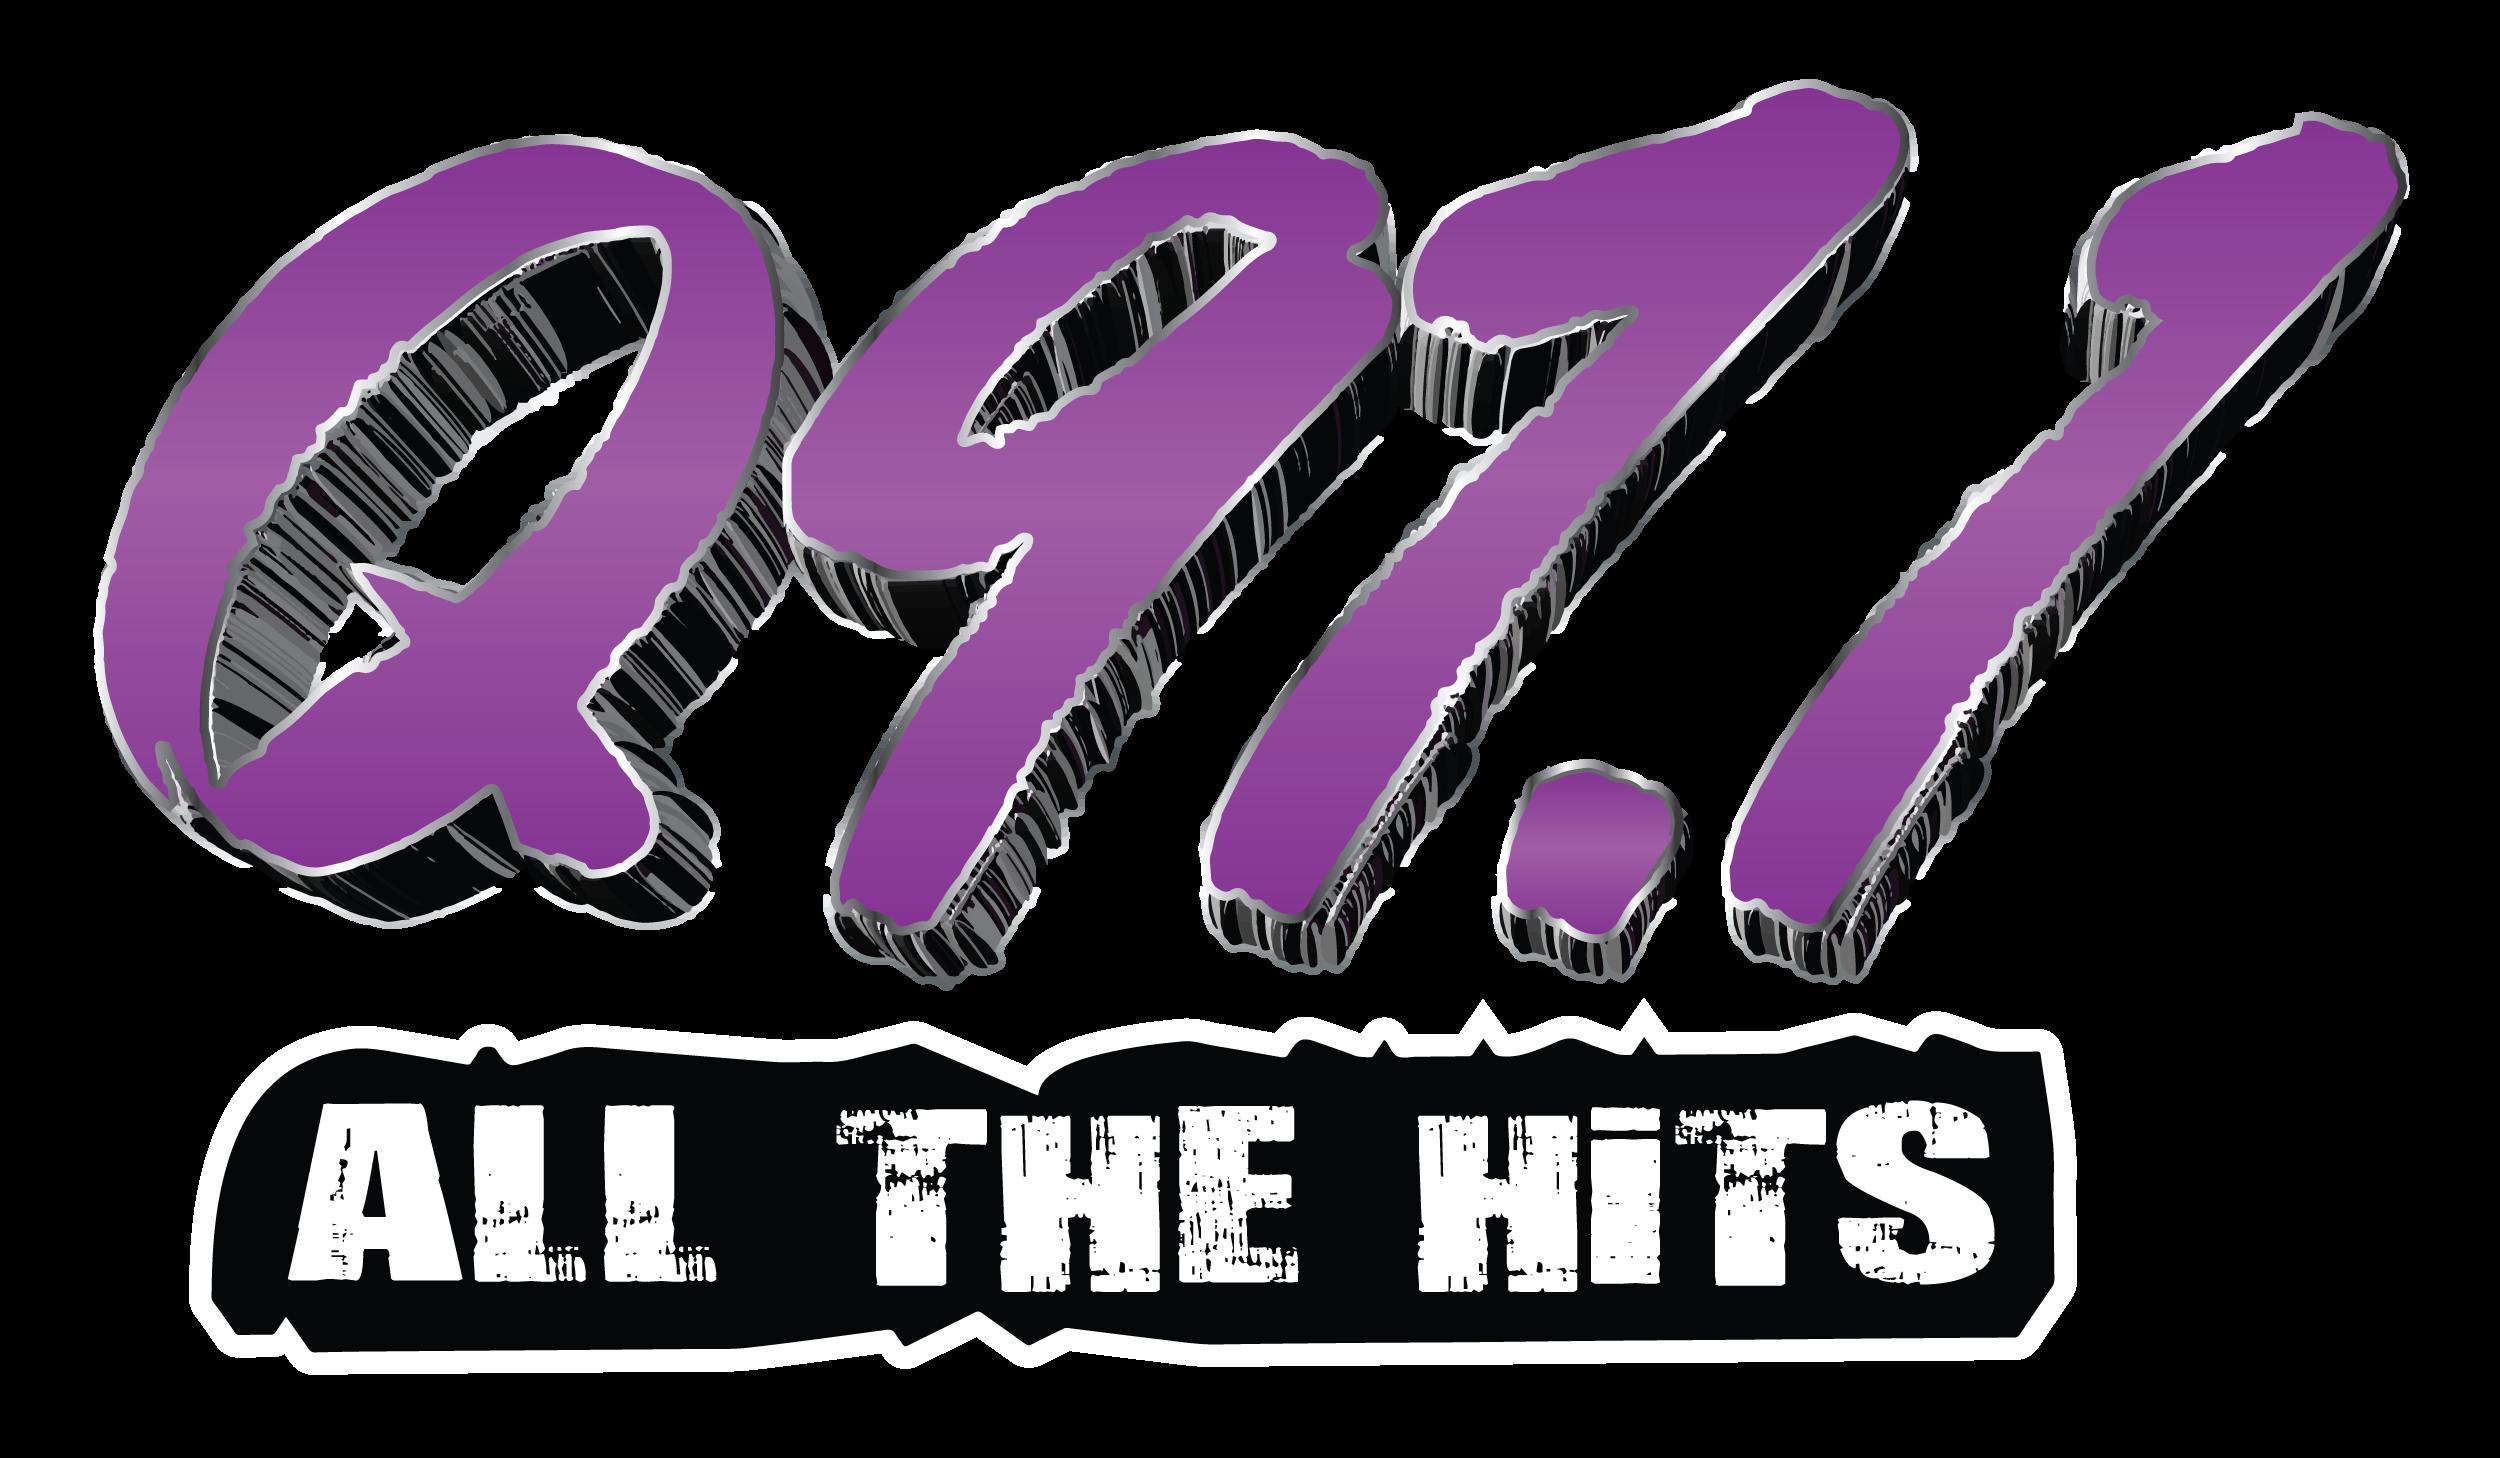 KSEQ 97.1 FM - Fresno, CA - Top 40